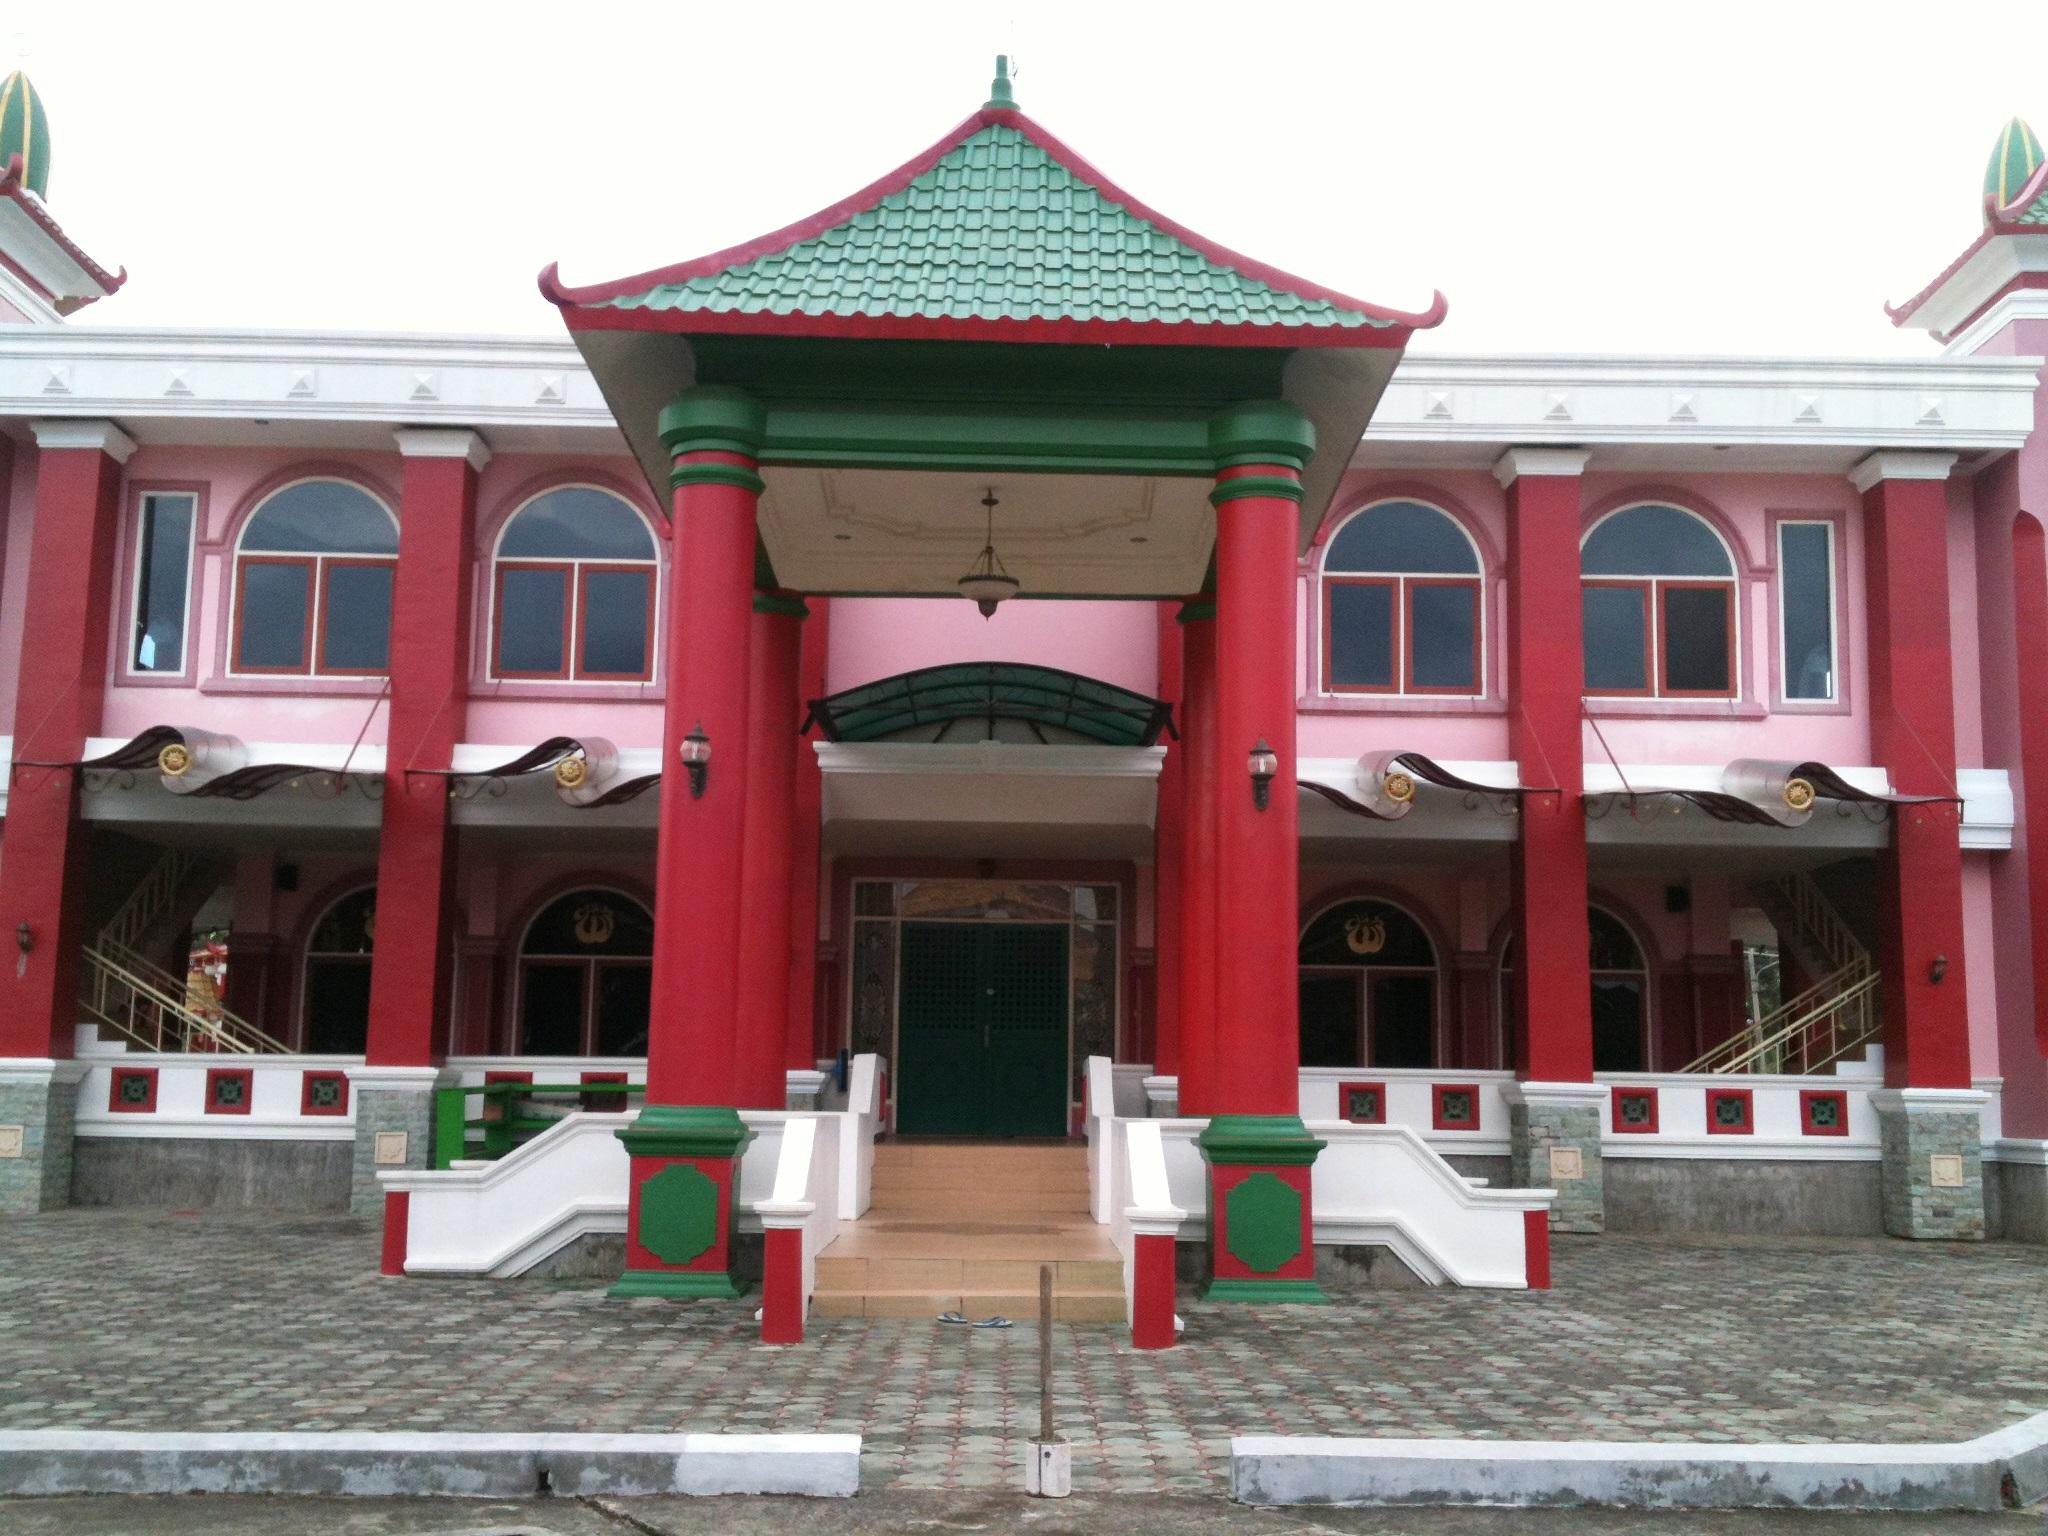 Wisata Religi Masjid Cheng Hoo Palembang Al Islam Muhammad Sriwijaya